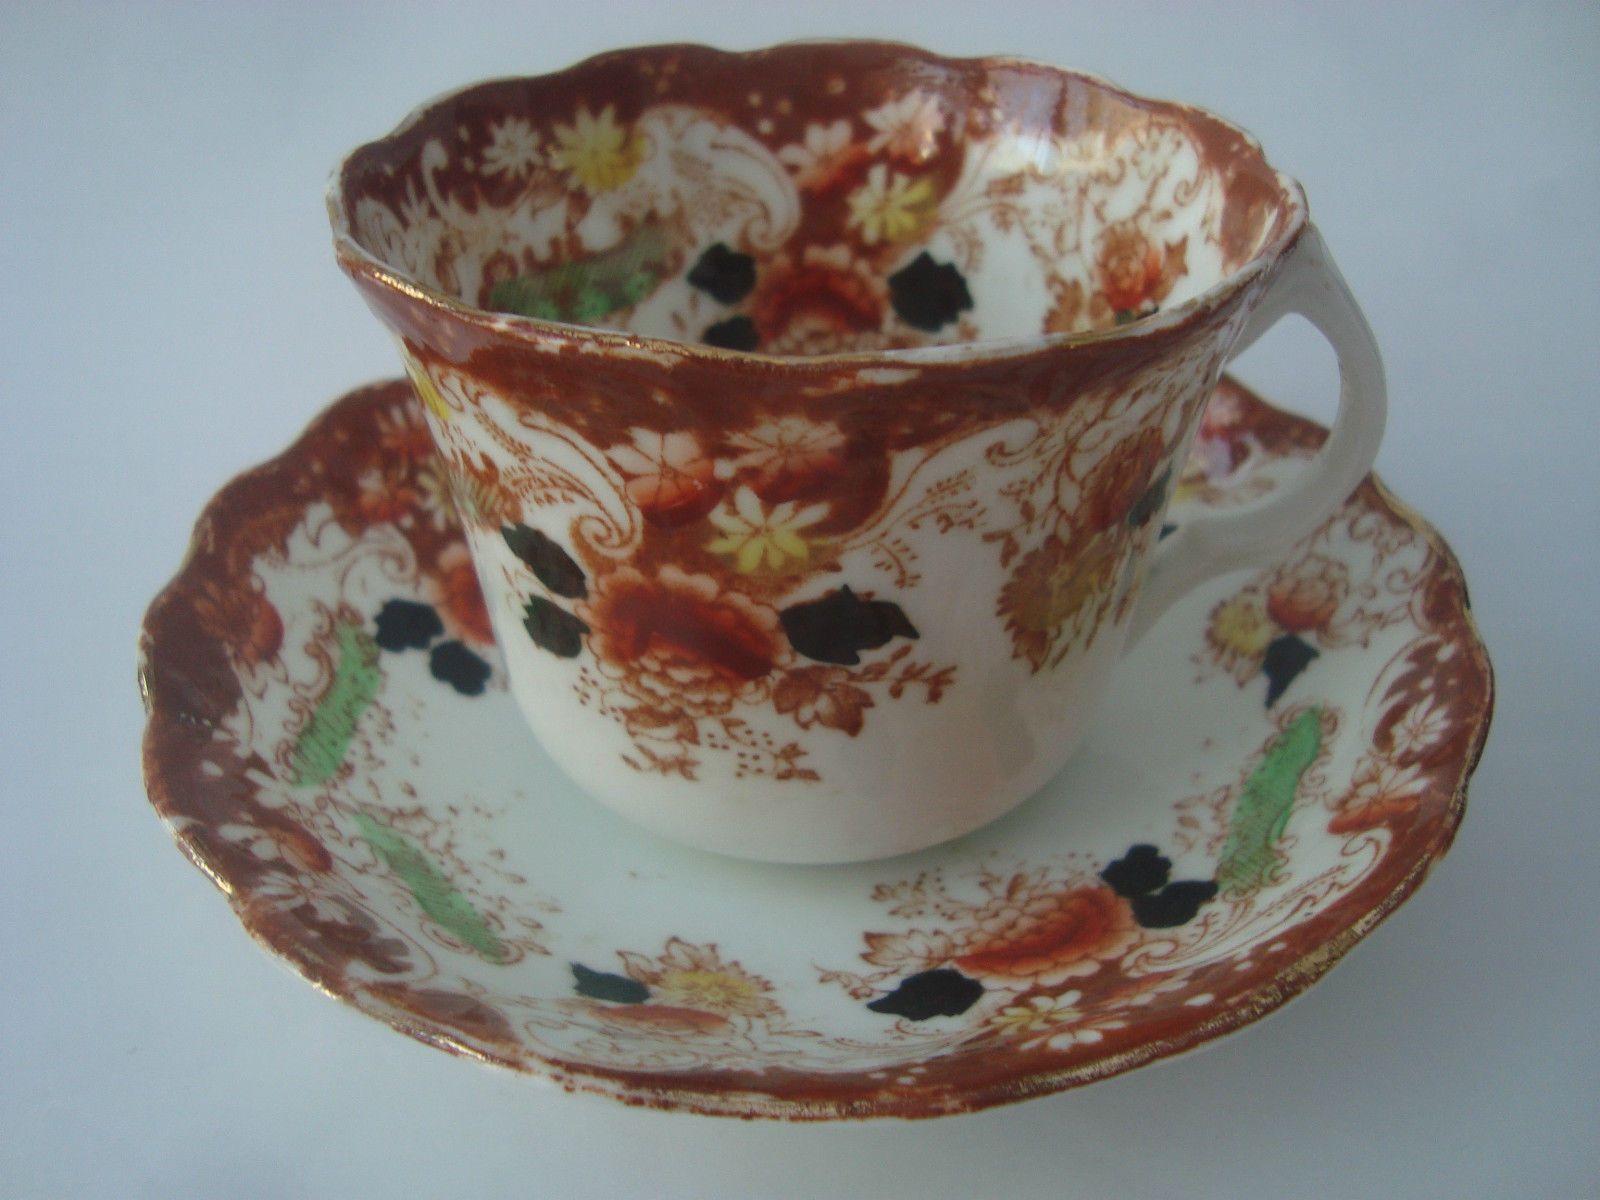 in Pottery, Porcelain & Glass, Porcelain/China, Royal Albert